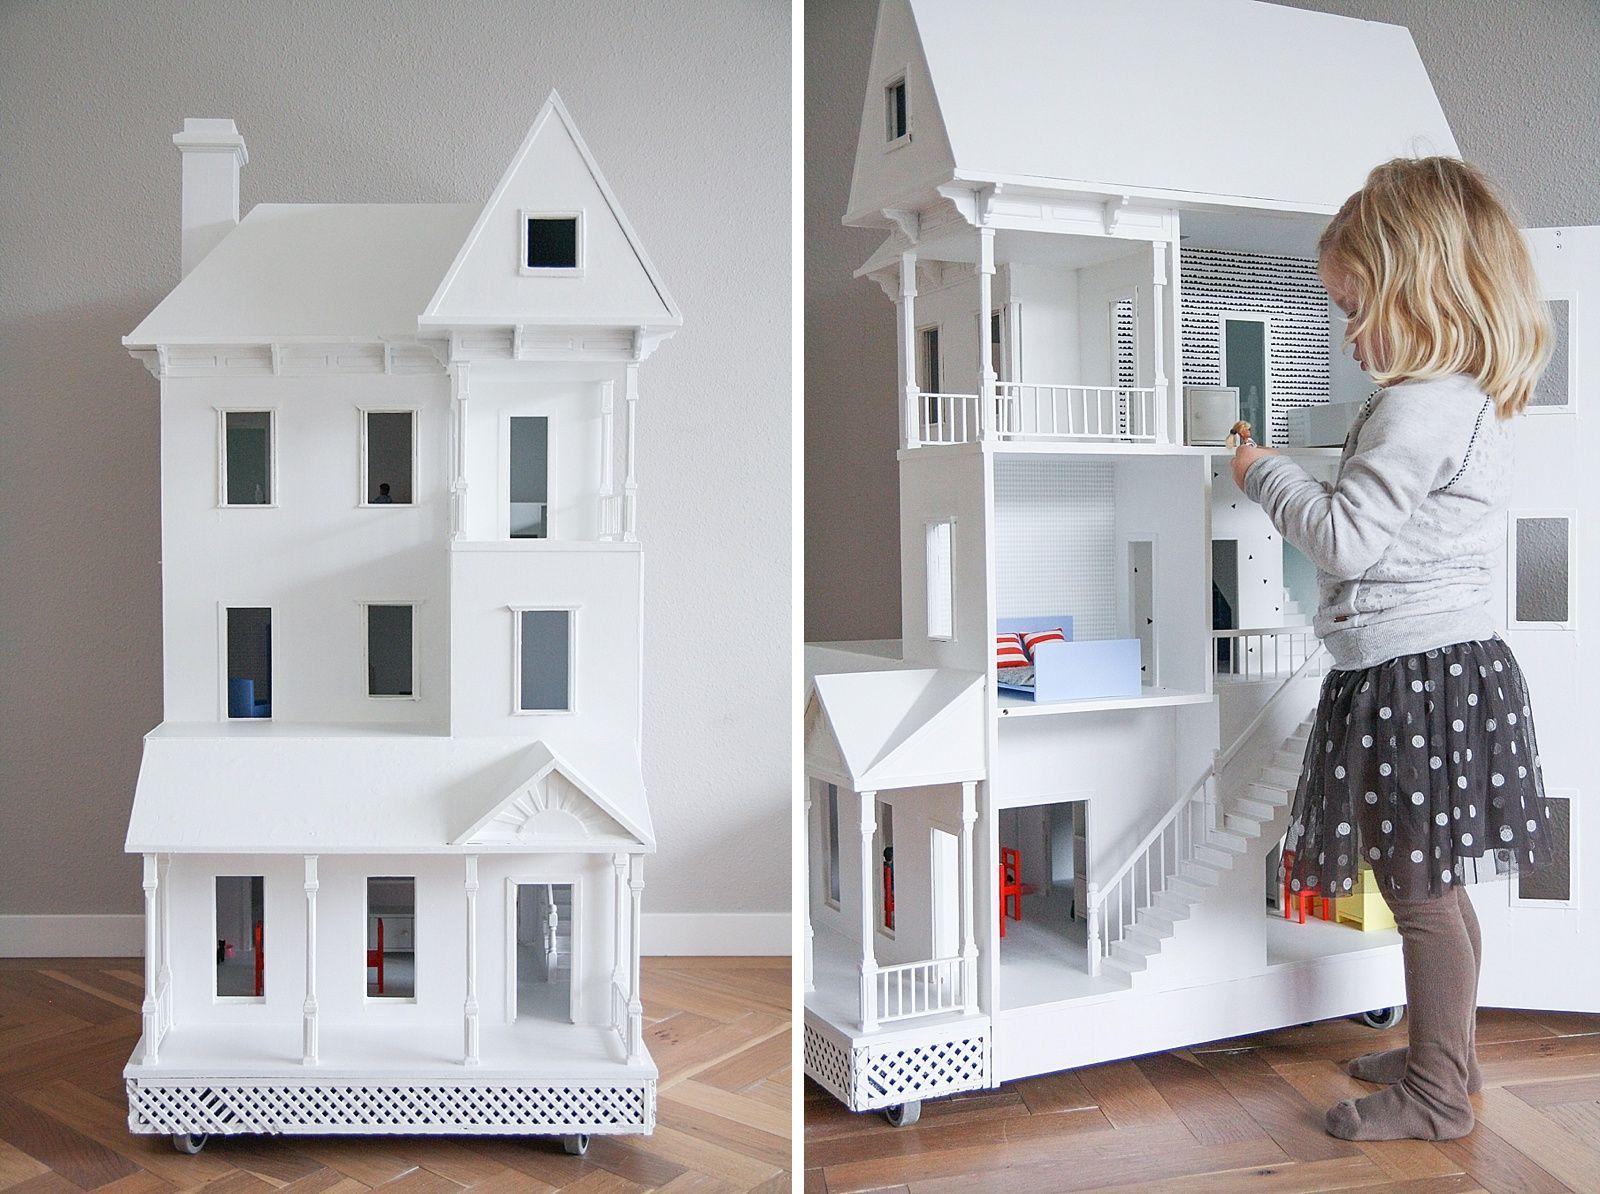 Diy The Dollhouse Project Doll House Plans Doll House Barbie Doll House